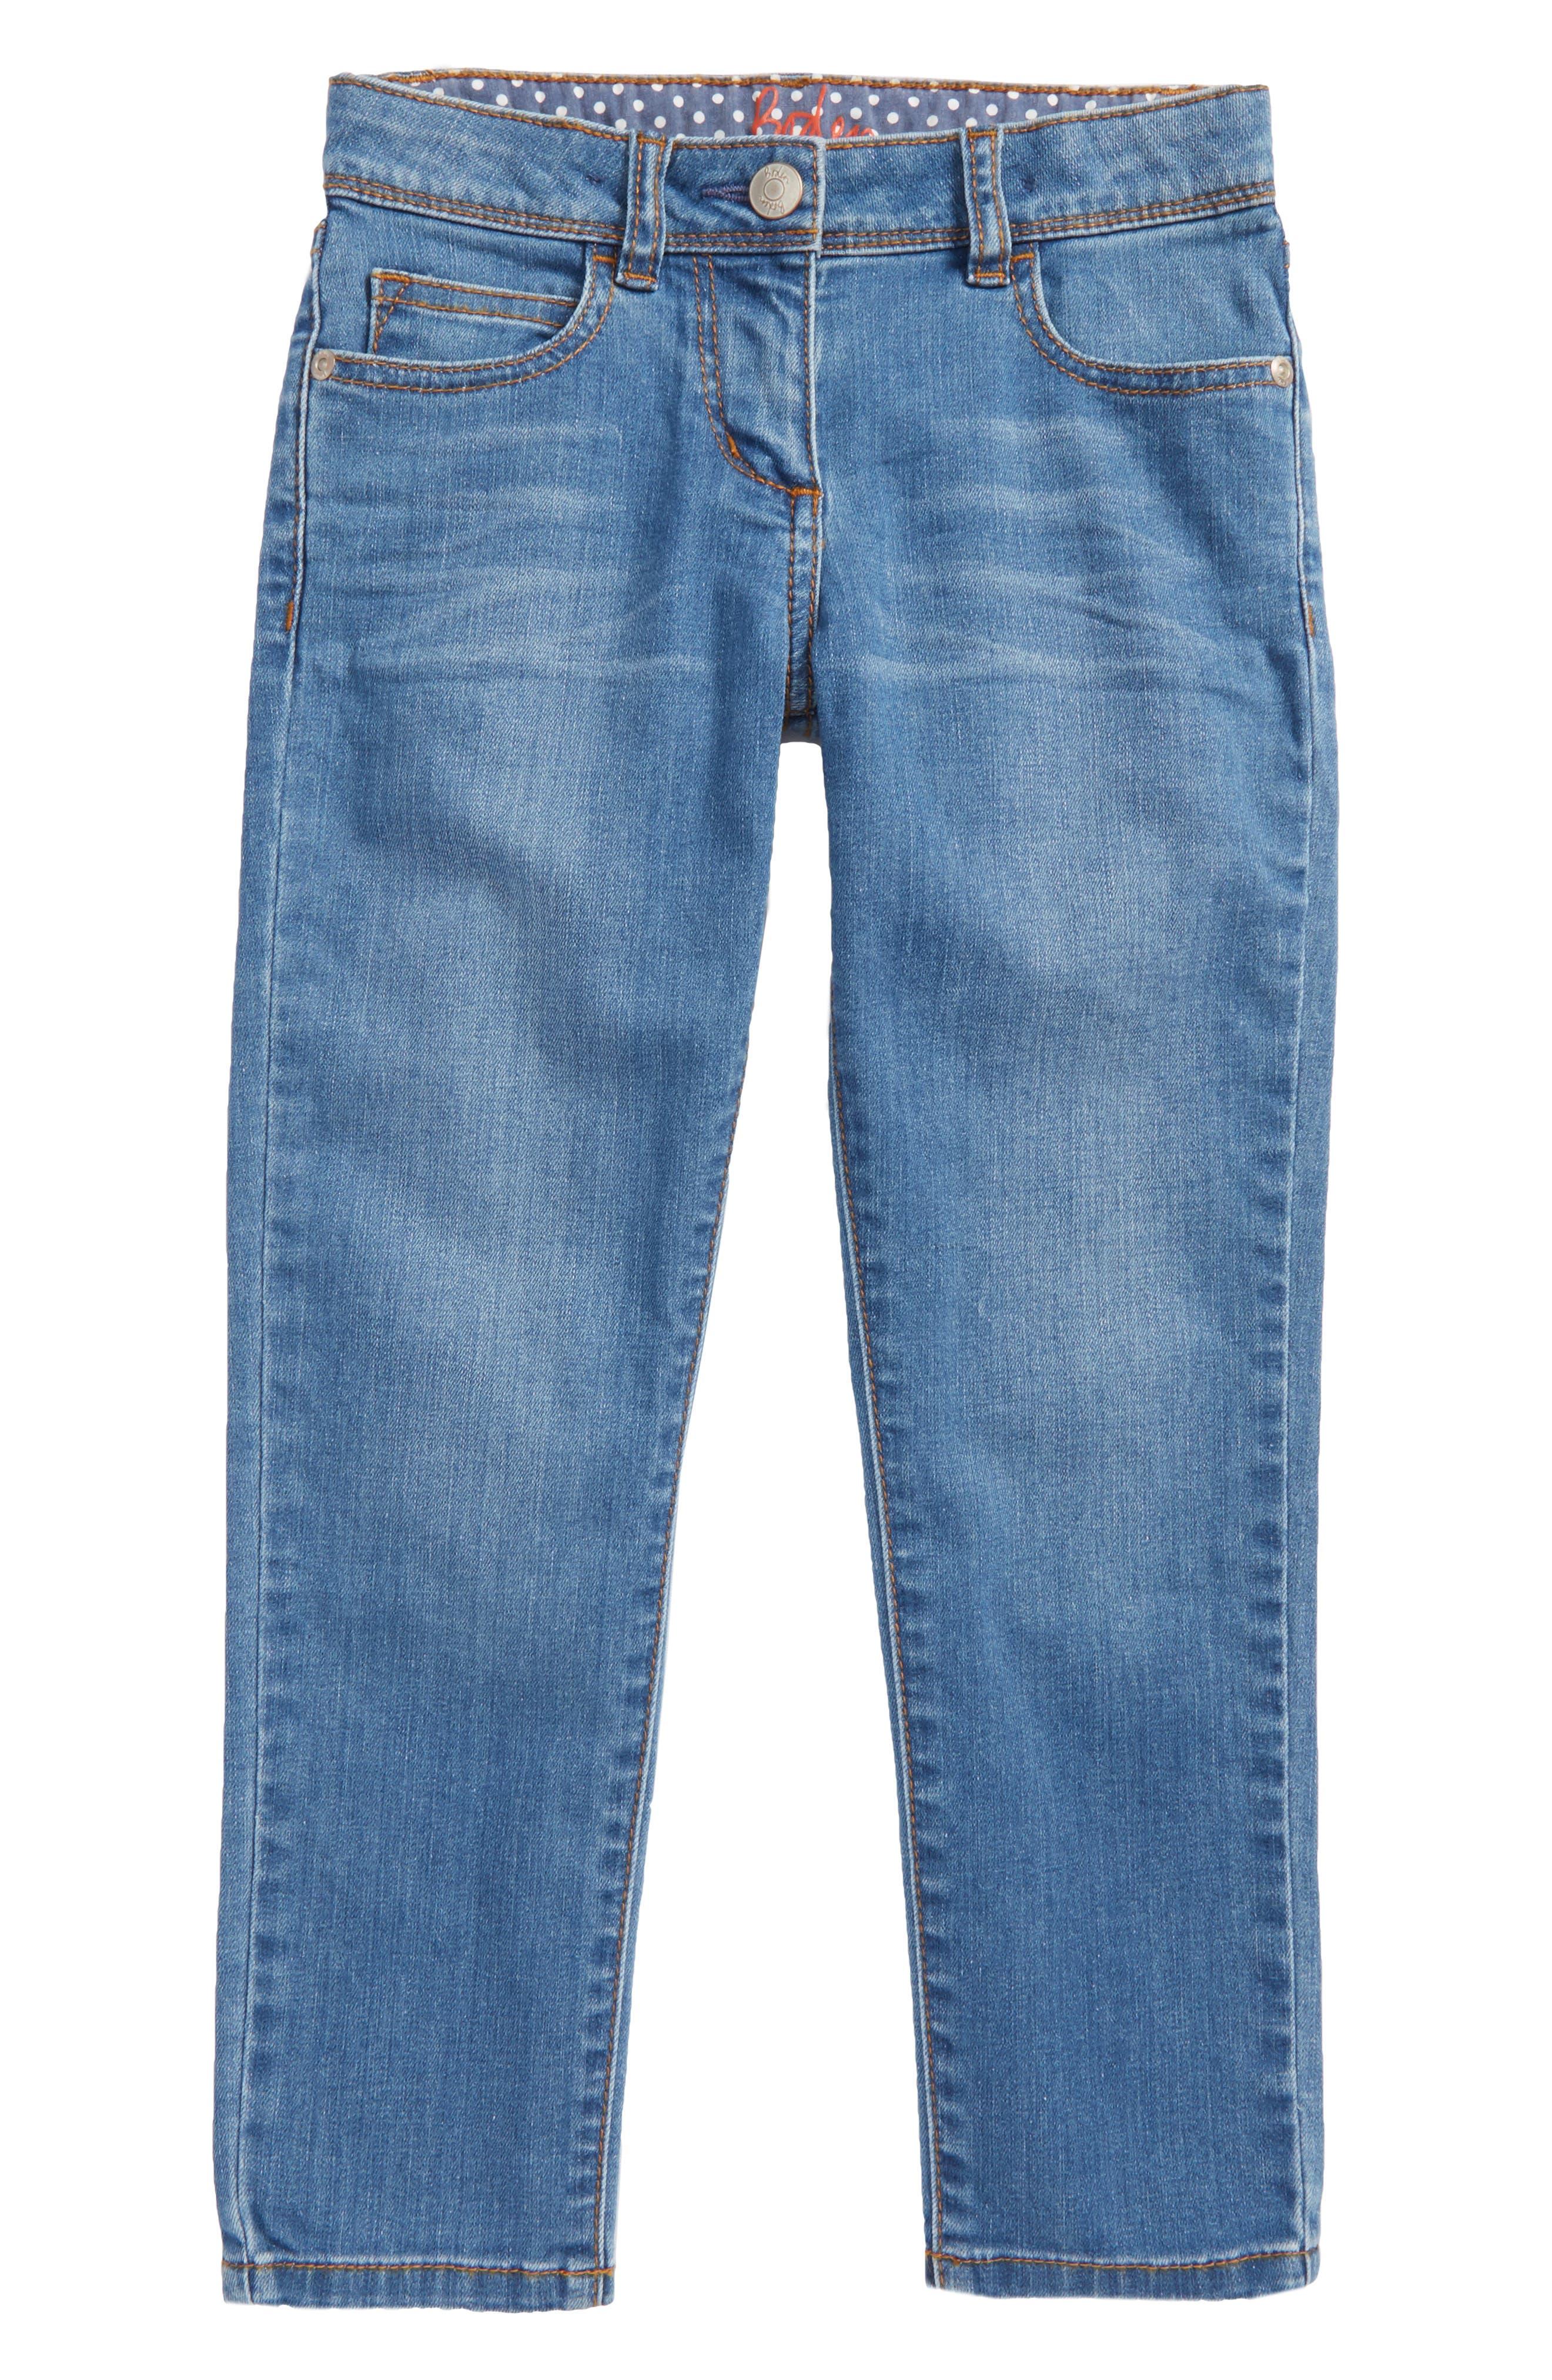 Skinny Jeans,                         Main,                         color, Light Vintage Ldn